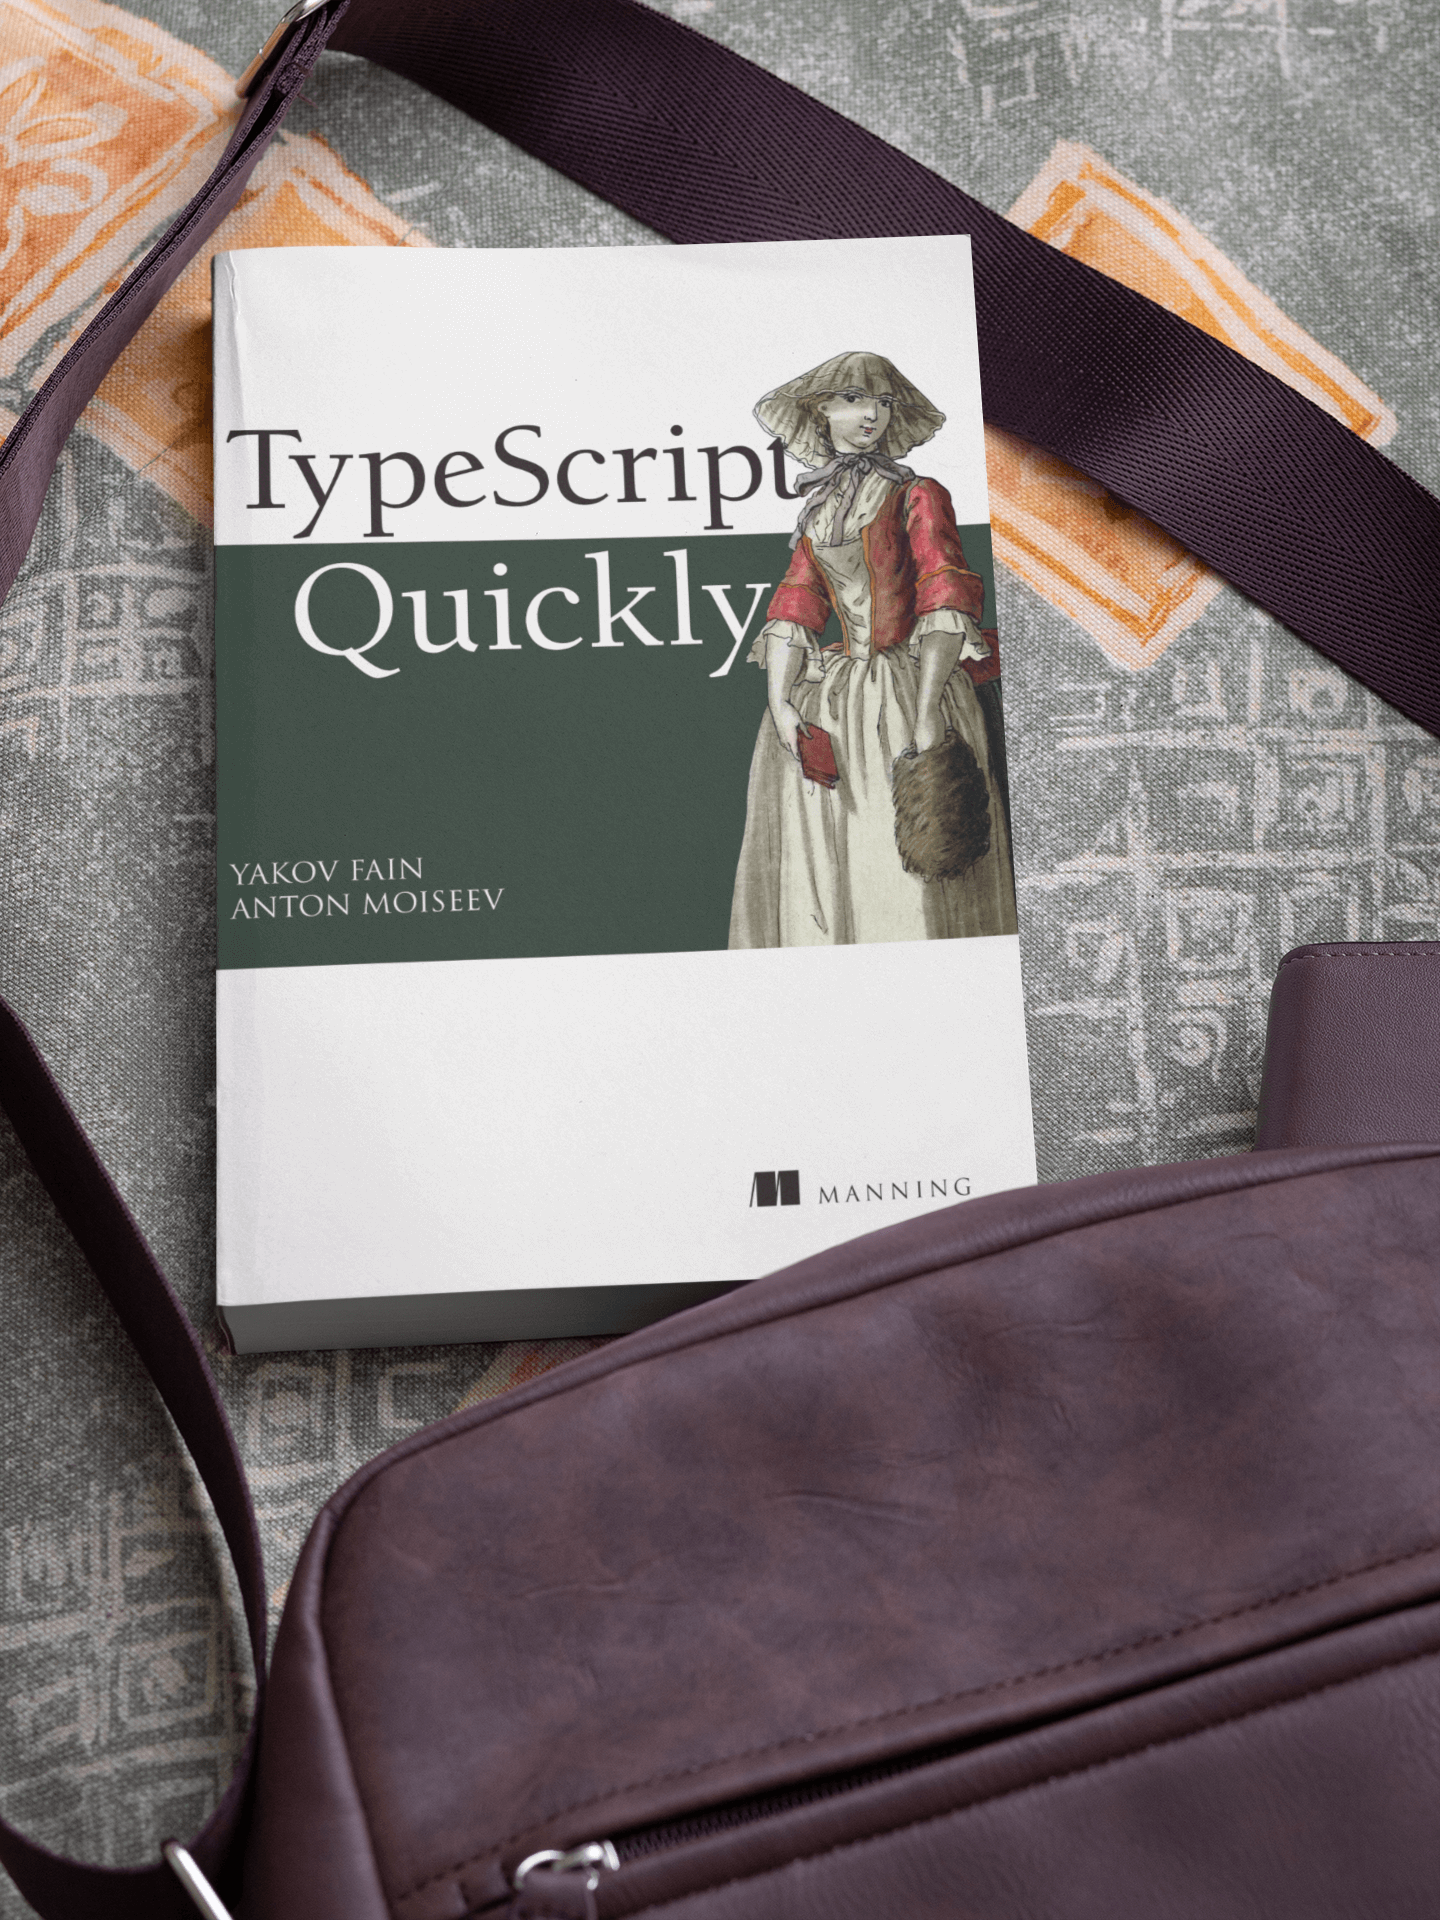 typescript-quickly-mockup